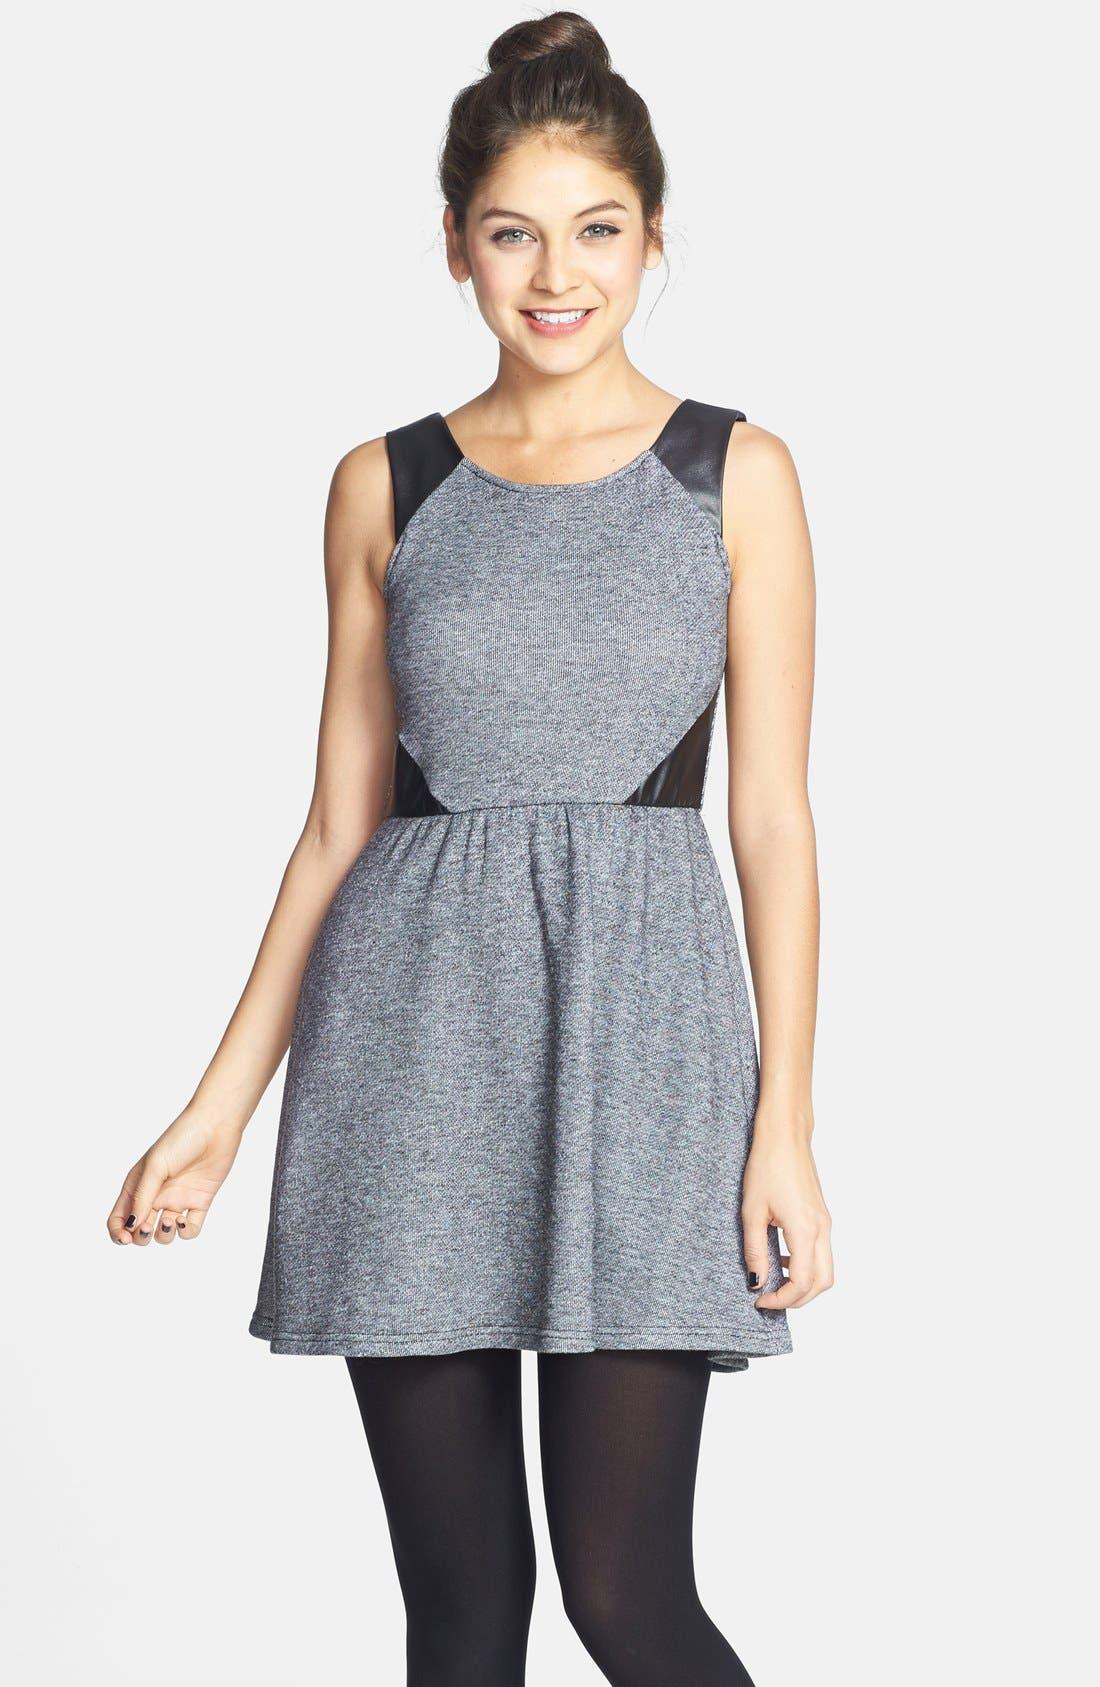 Main Image - Socialite Faux Leather Insert Skater Dress (Juniors) (Online Only)